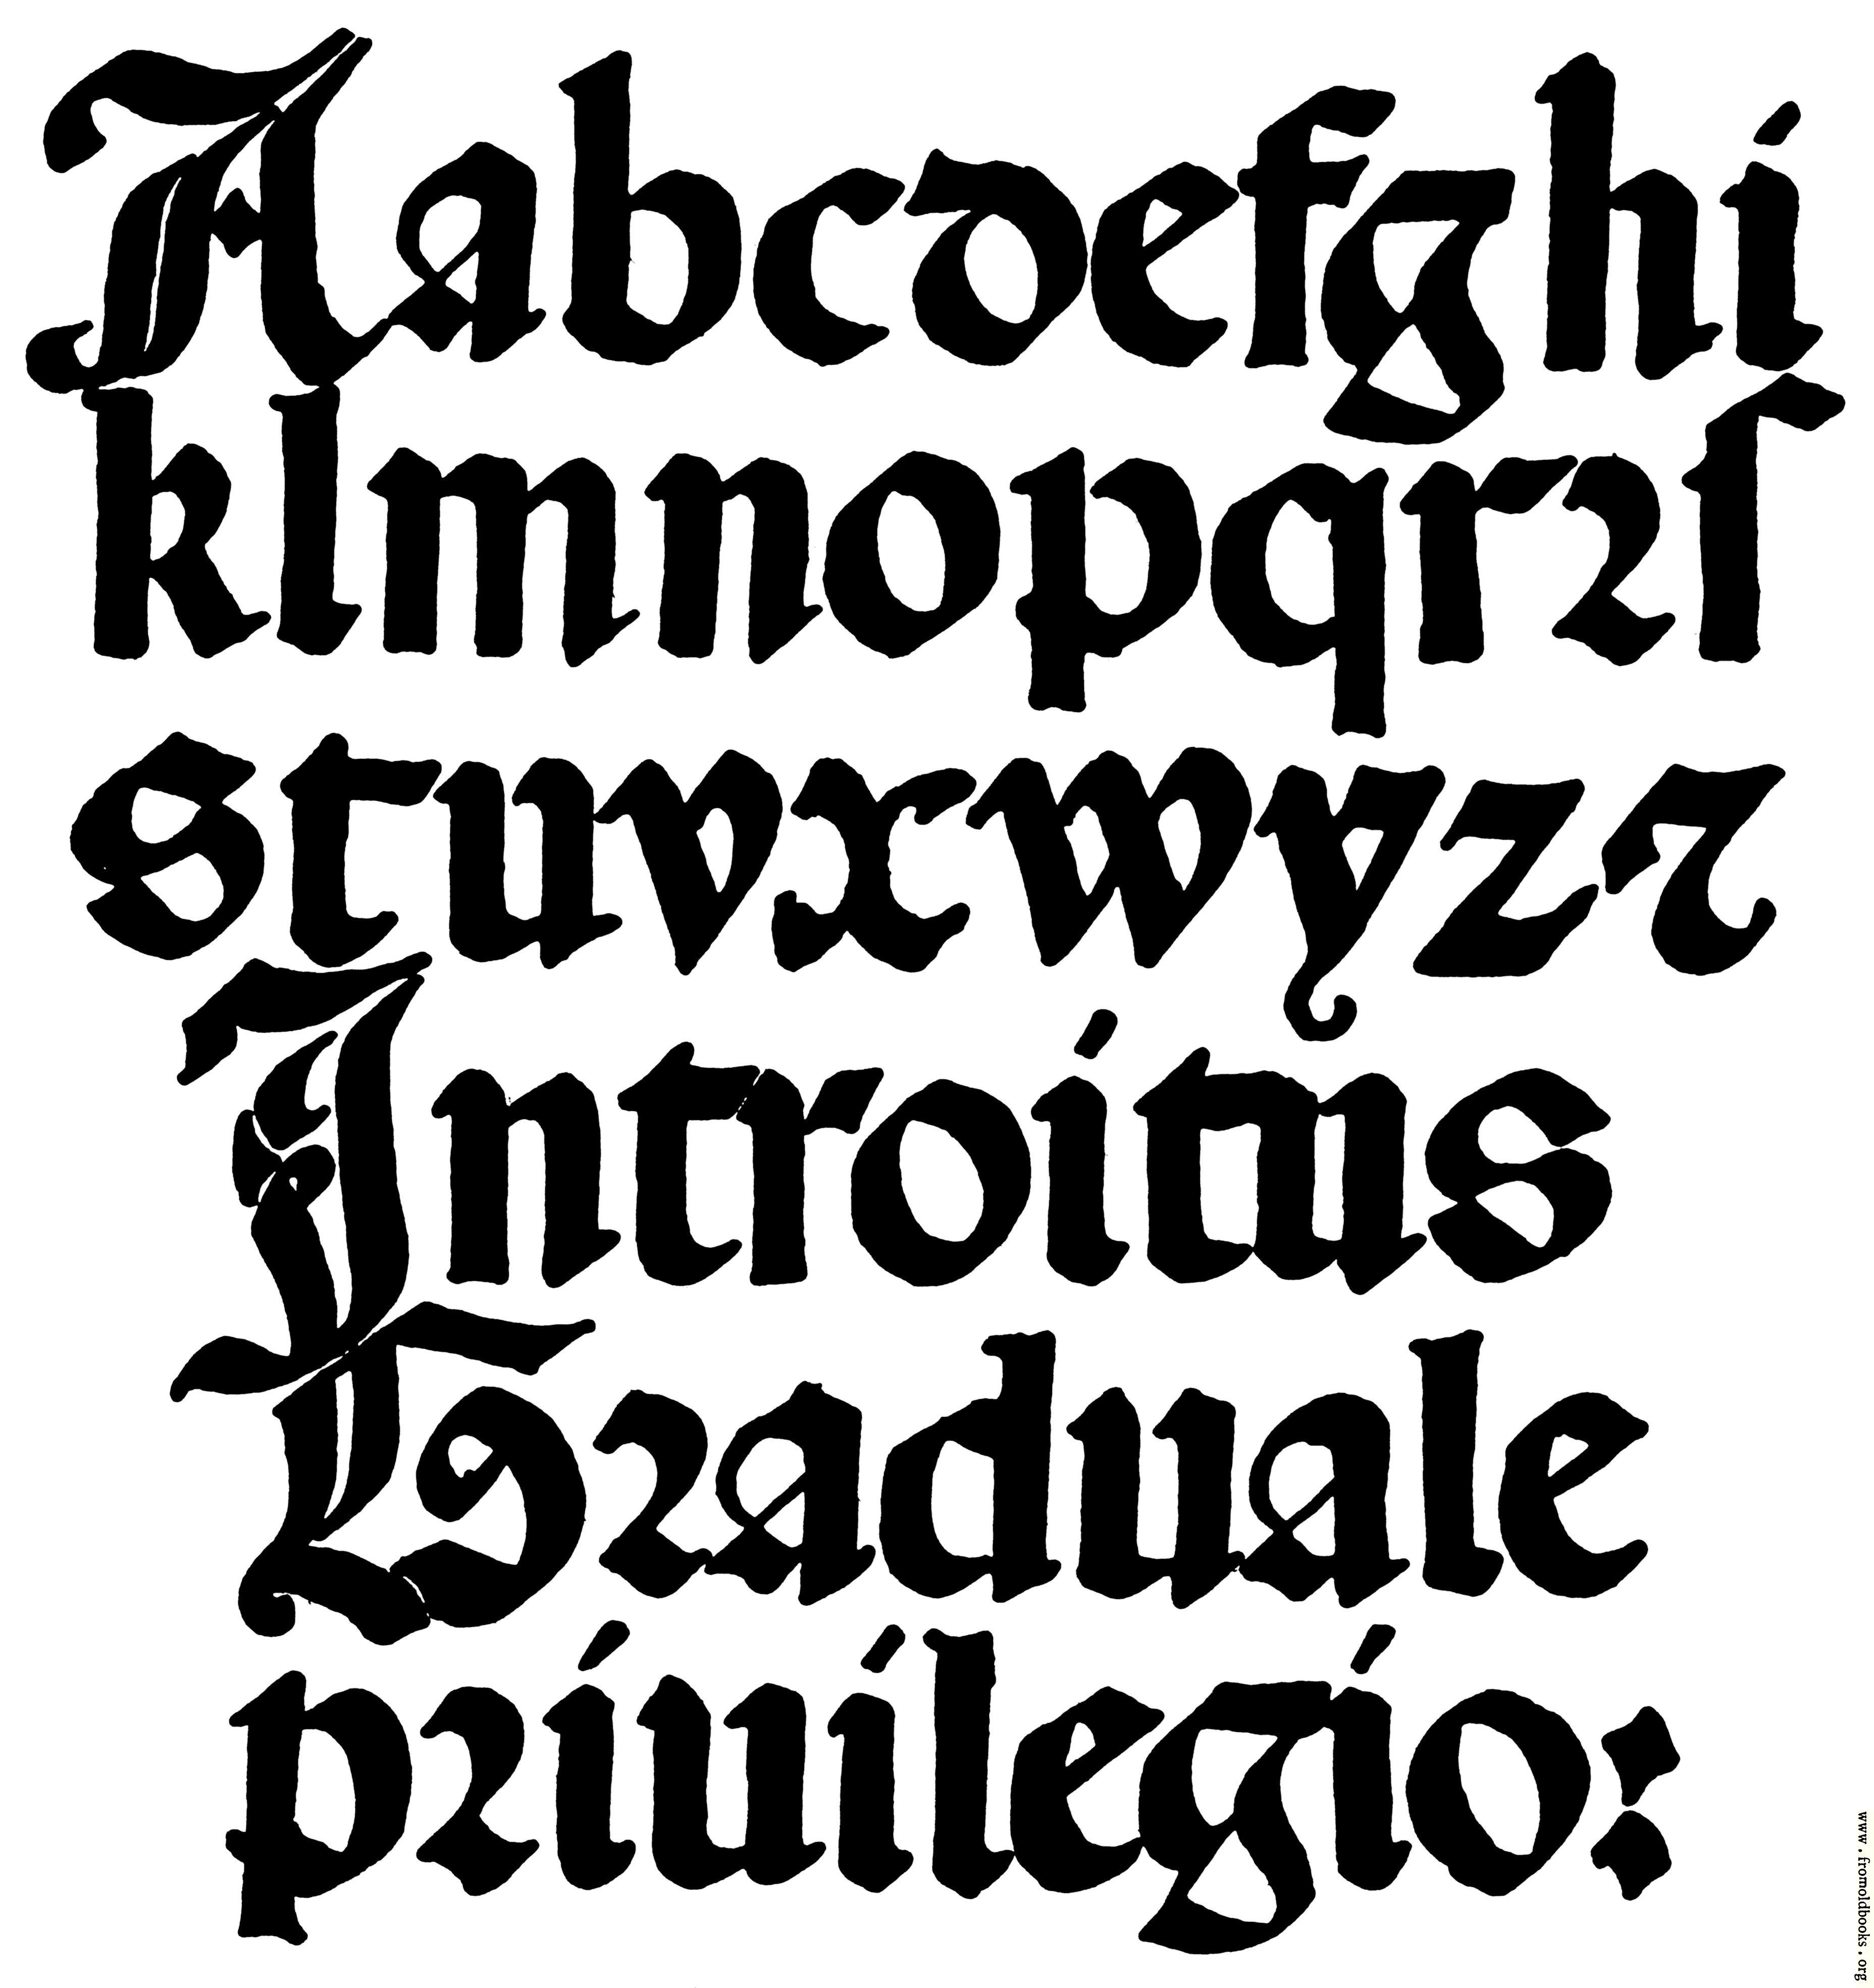 Old English Tattoo Font Generator